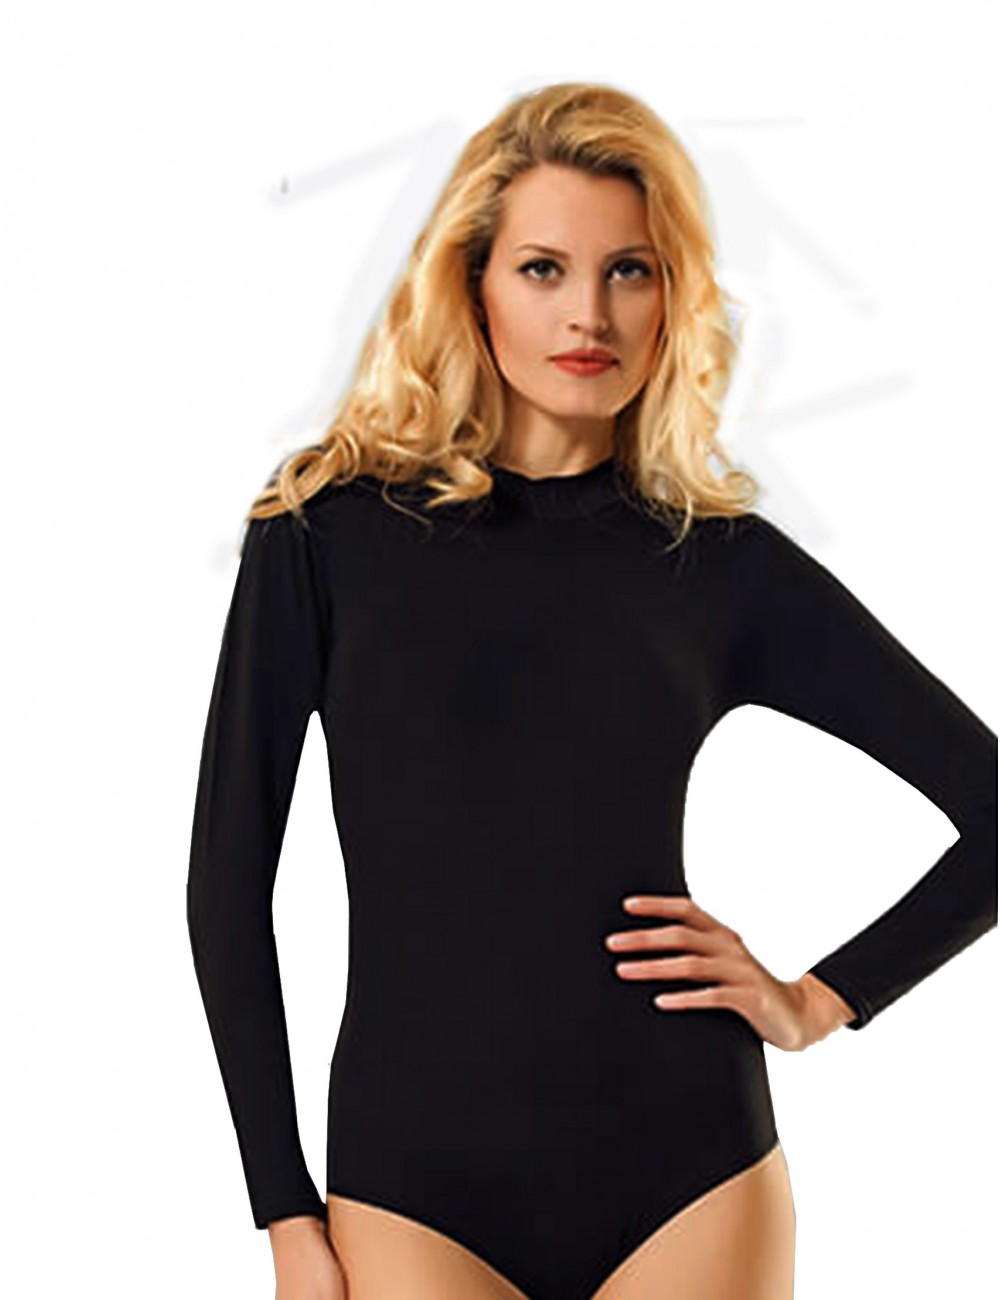 896b1c045c54 Γυναικείο βαμβακερό κορμάκι ζιβάγκο μακρύ μανίκι σε λευκό κια μαύρο χρώμα  267